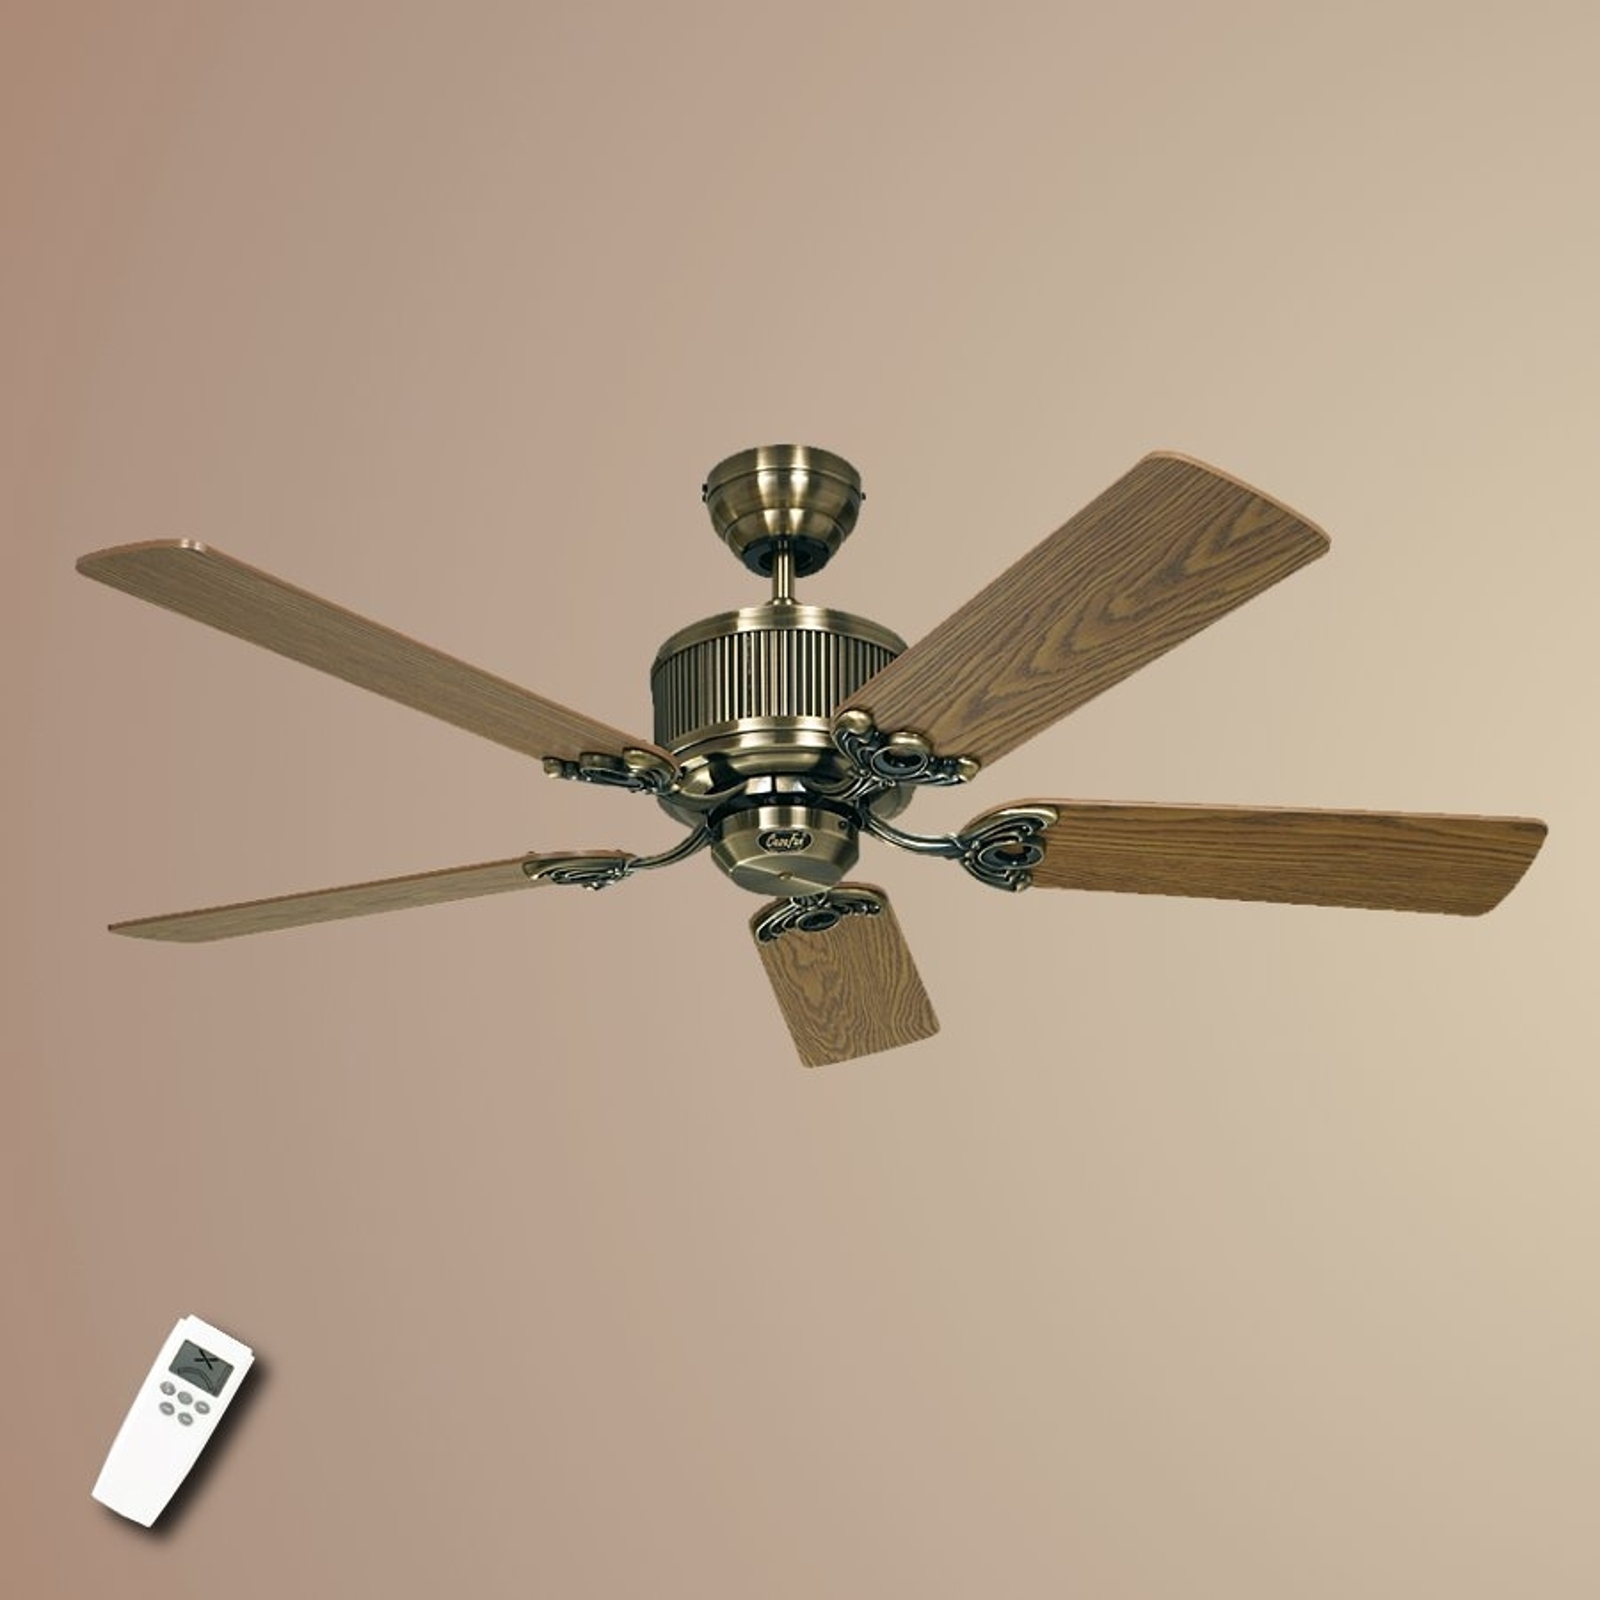 Classic ceiling fan Eco Elements_2015016_1